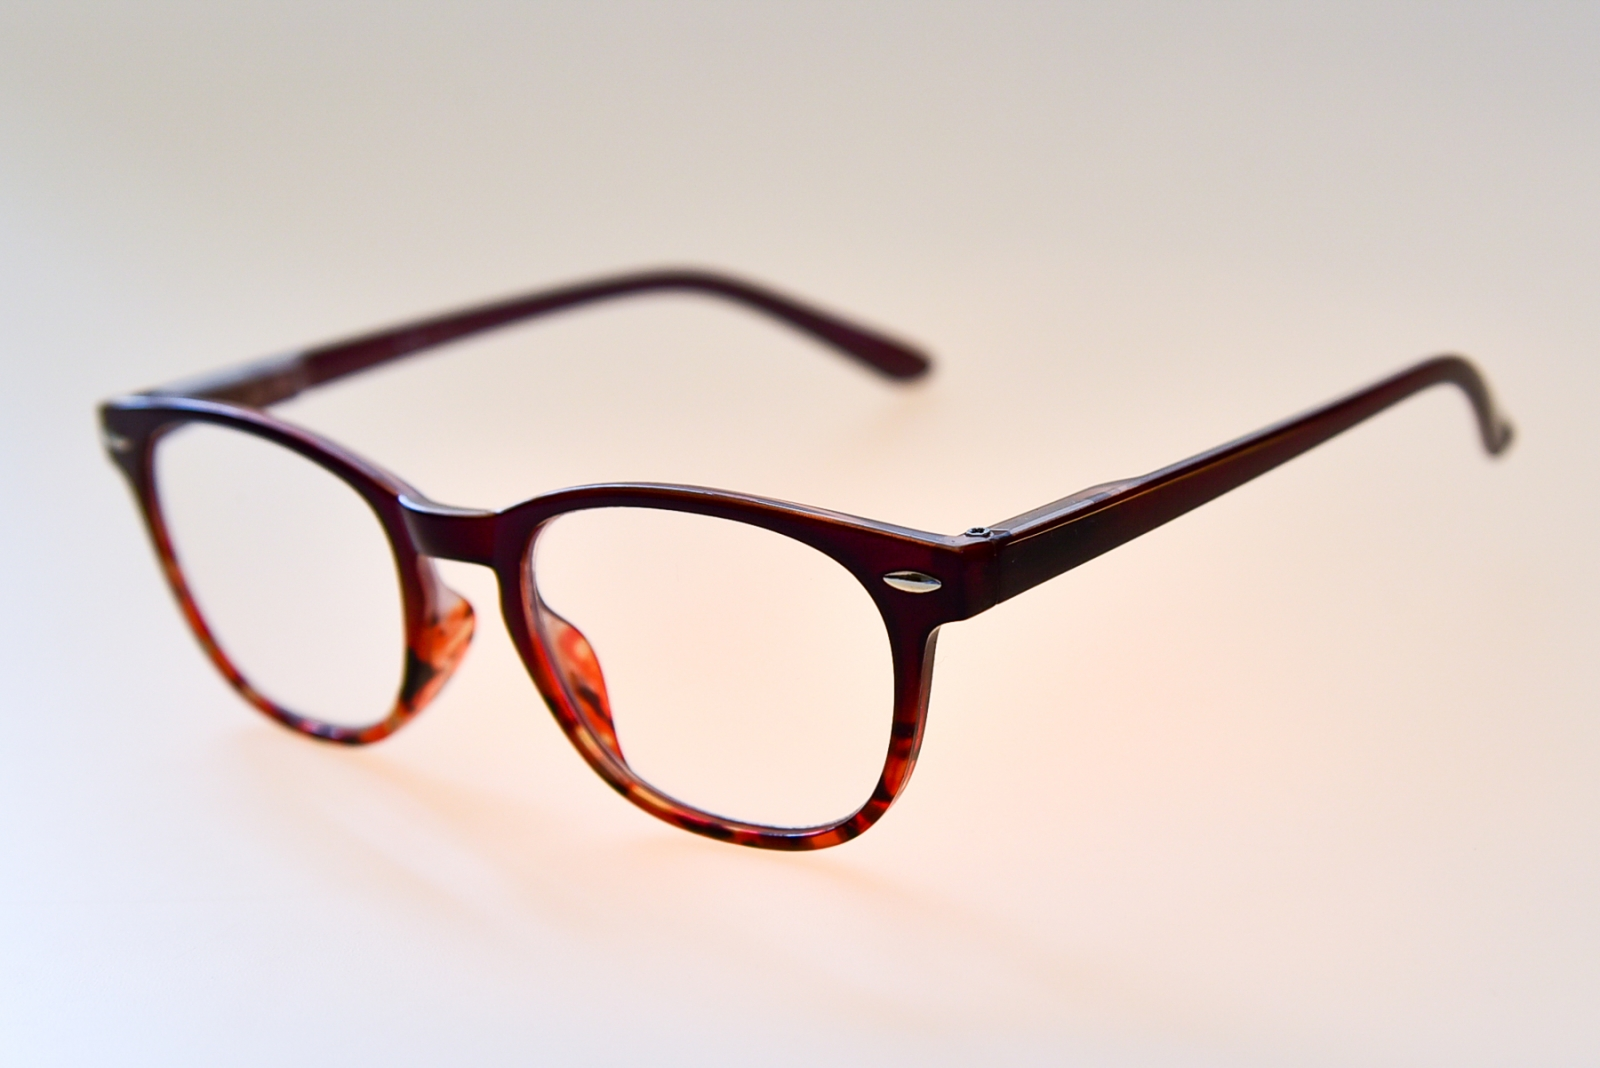 Dioptrické okuliare 2052C - Dámske